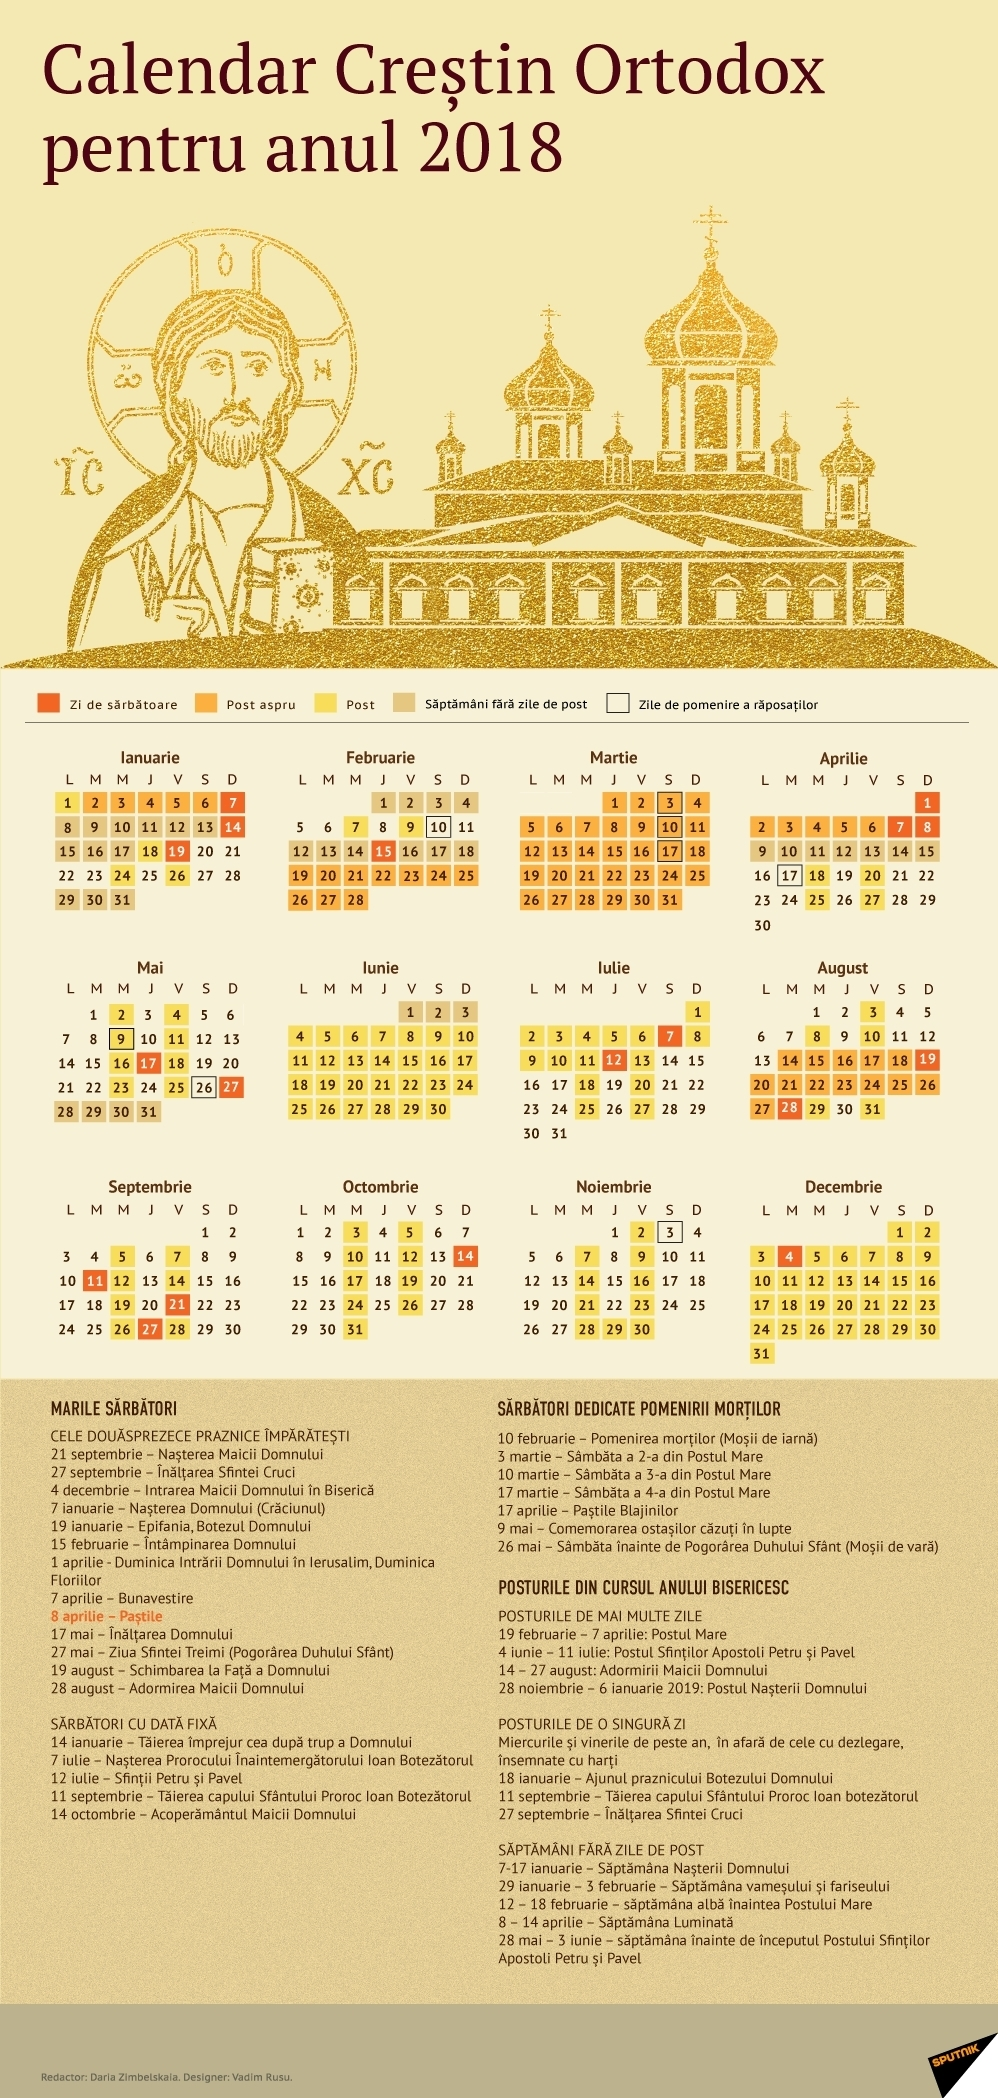 8 Iunie 2019 Calendar Ortodox | Ten Free Printable Calendar